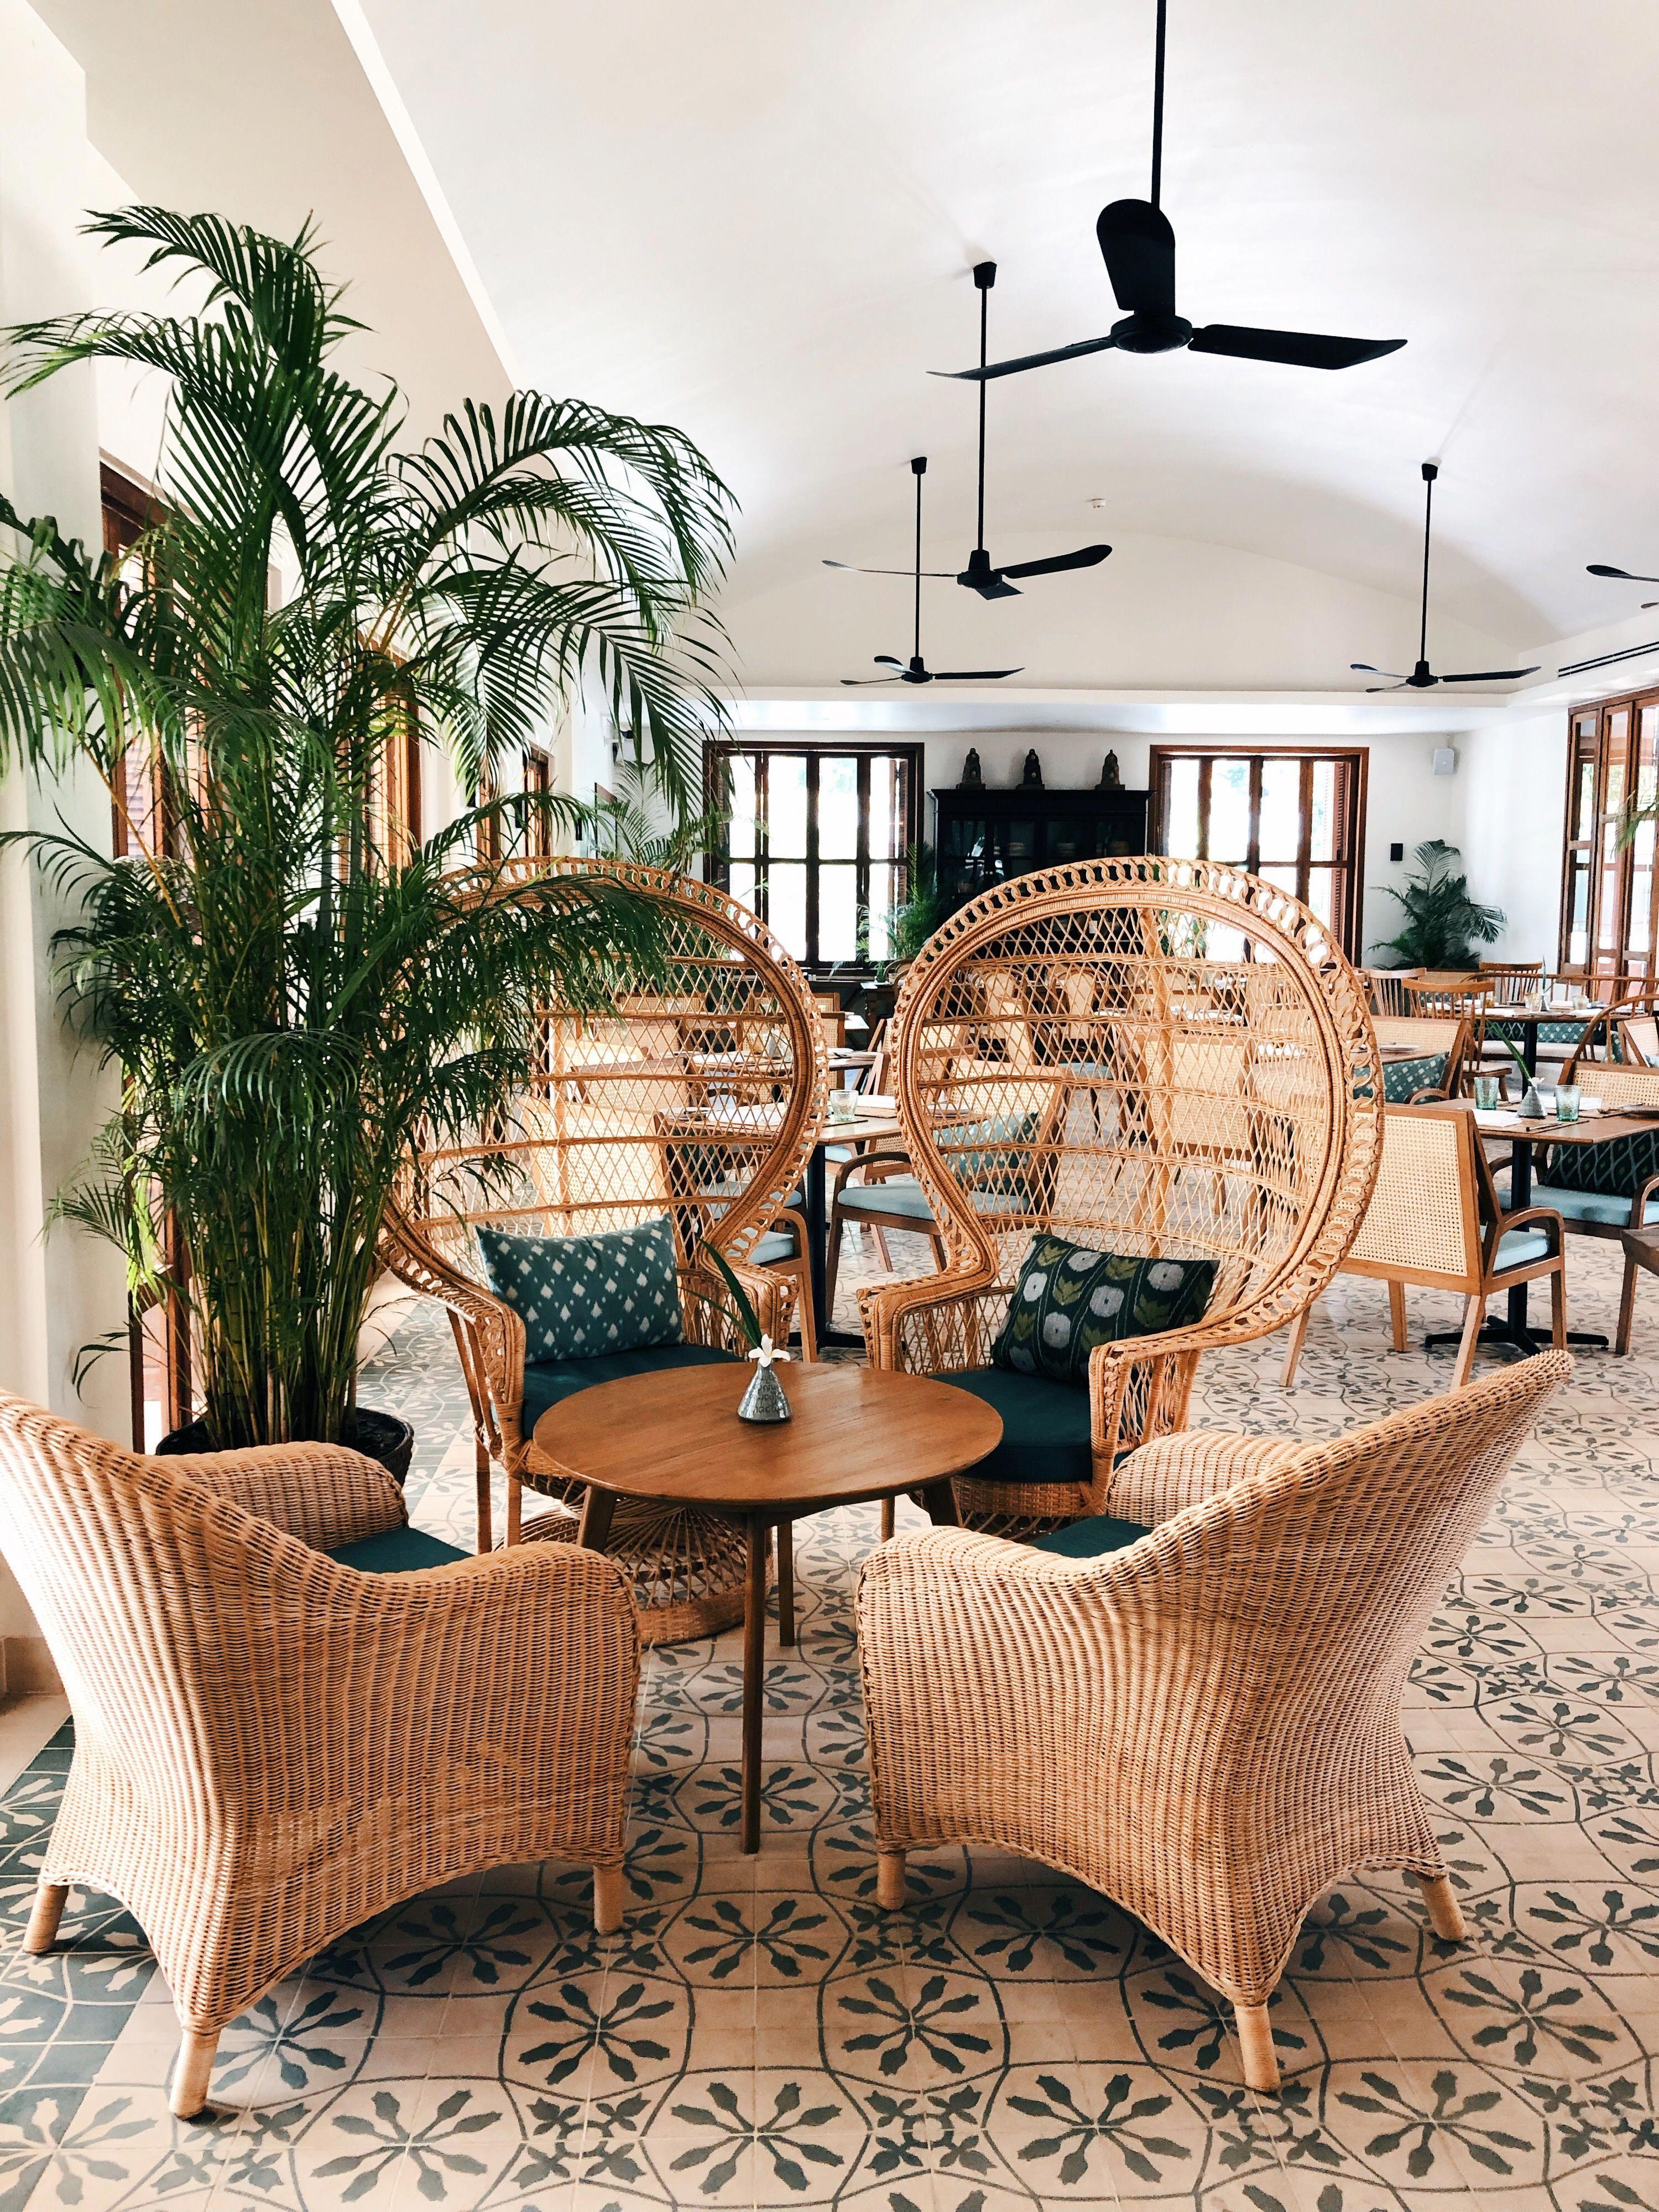 How gorgeous is the decor at FCC Angkor Avani Hotel Siem Reap Cambodia #rattanfurniture #rattanchair #bohemianstyle #bohemiandecor #bohemianhouse #bohostyle #bohochic #bohodecor #cambodia #cambodiatravel #siemreap #luxurytravel #travelblogger #luxuryhotel #avanihotels #WholesaleHomeDecor